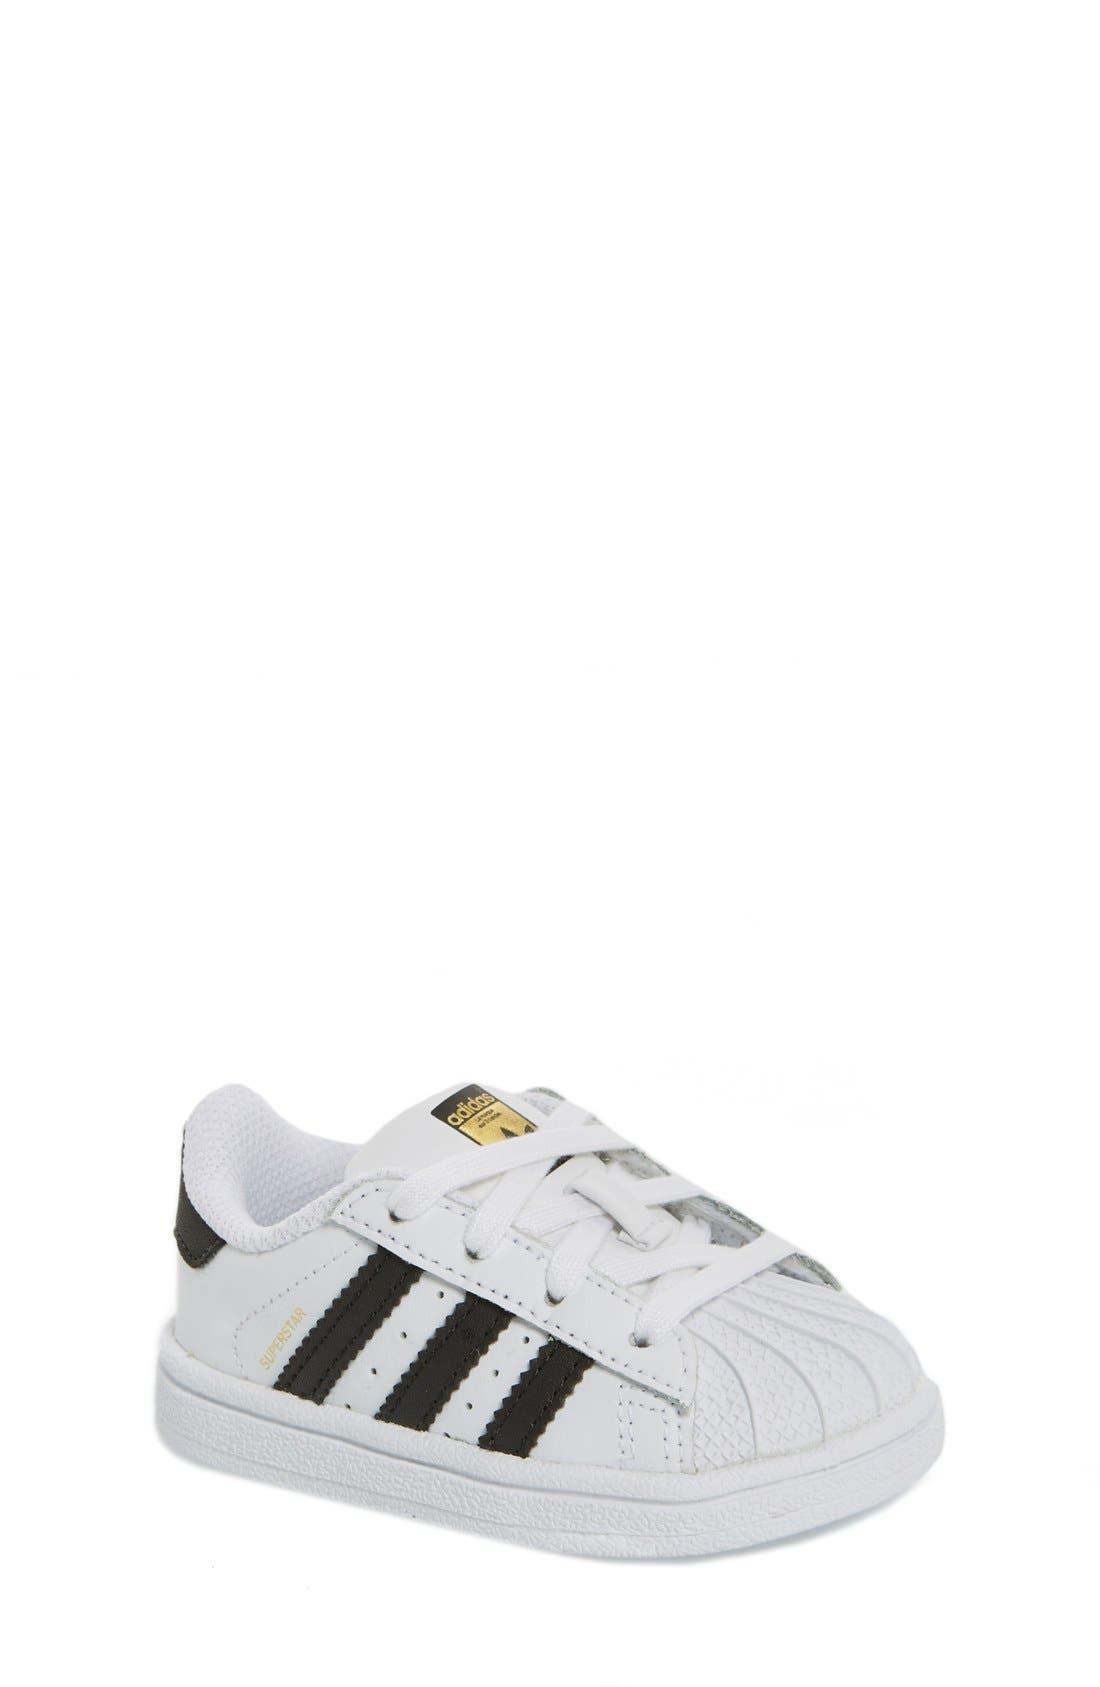 'Superstar' Sneaker,                             Main thumbnail 1, color,                             101